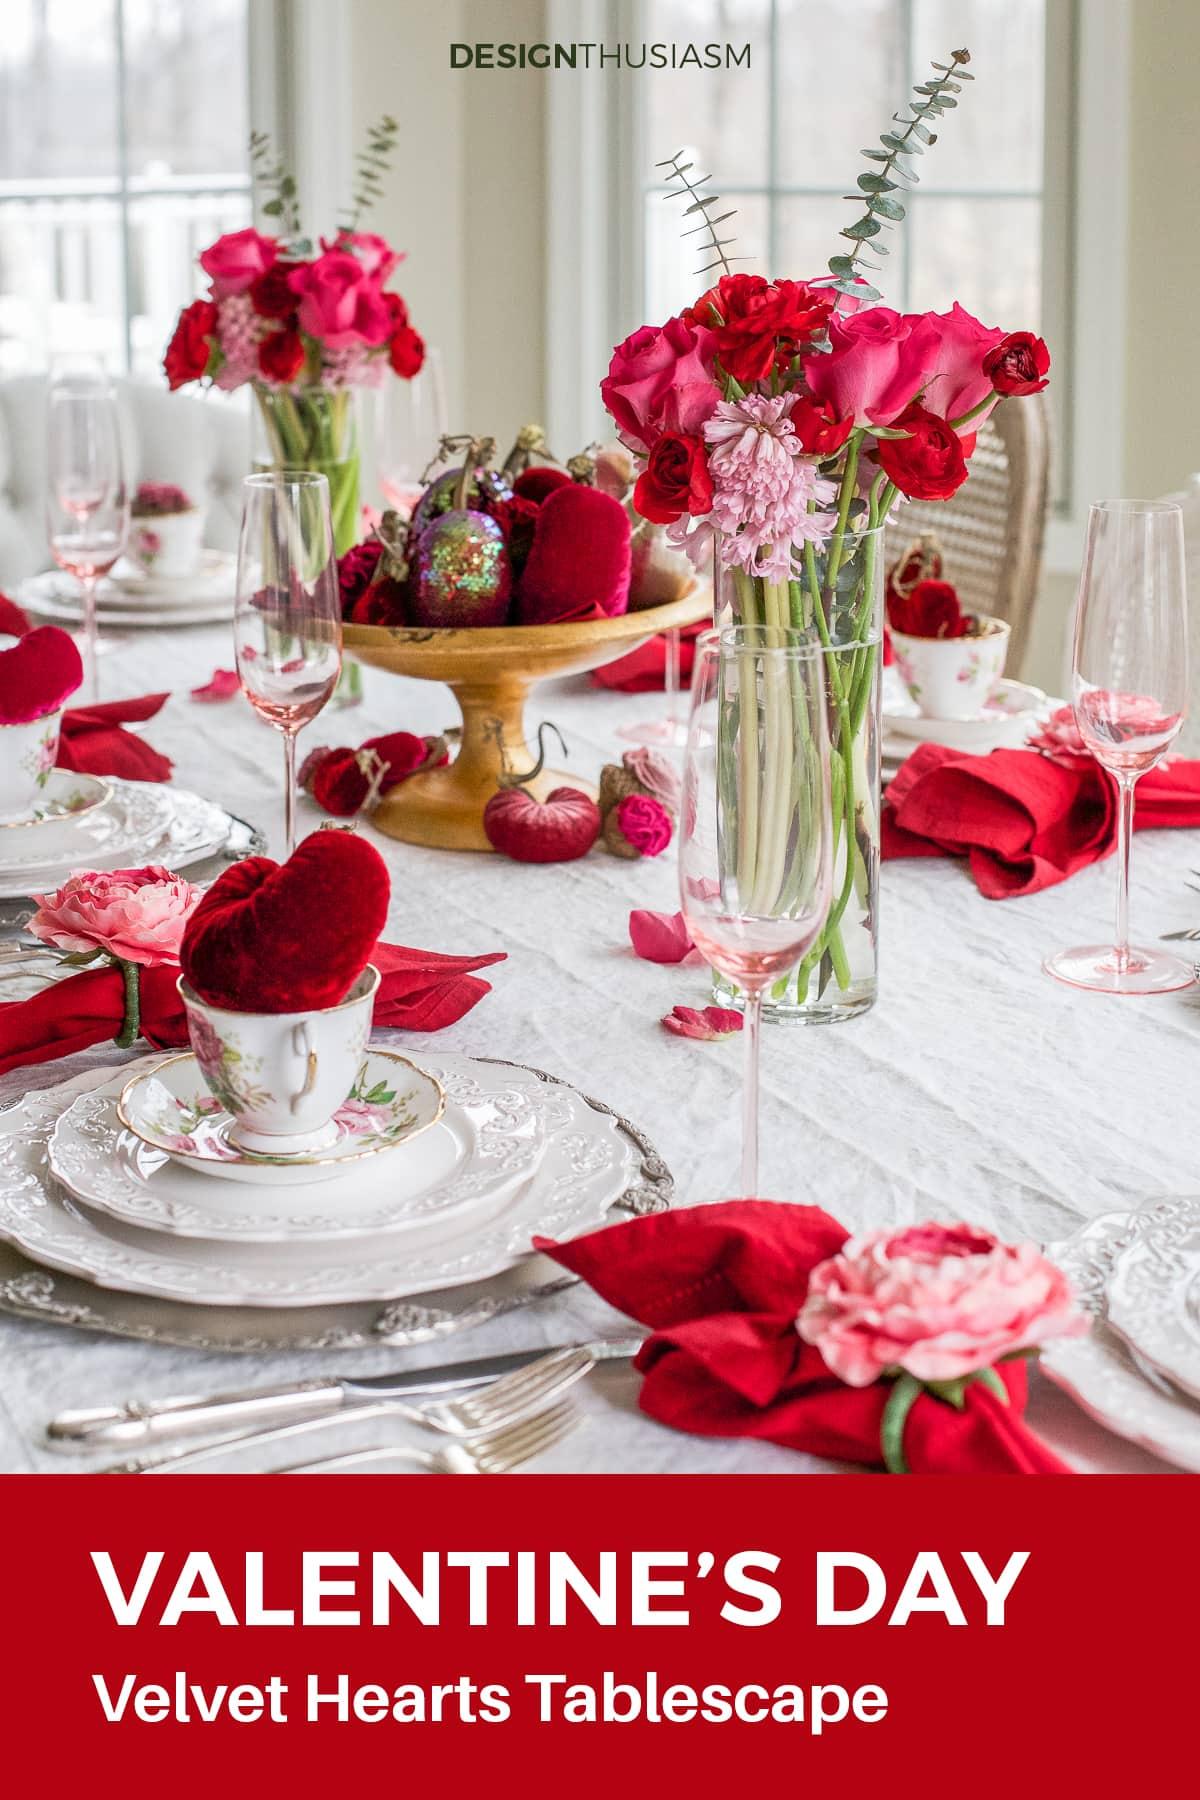 velvet hearts valentine's day table